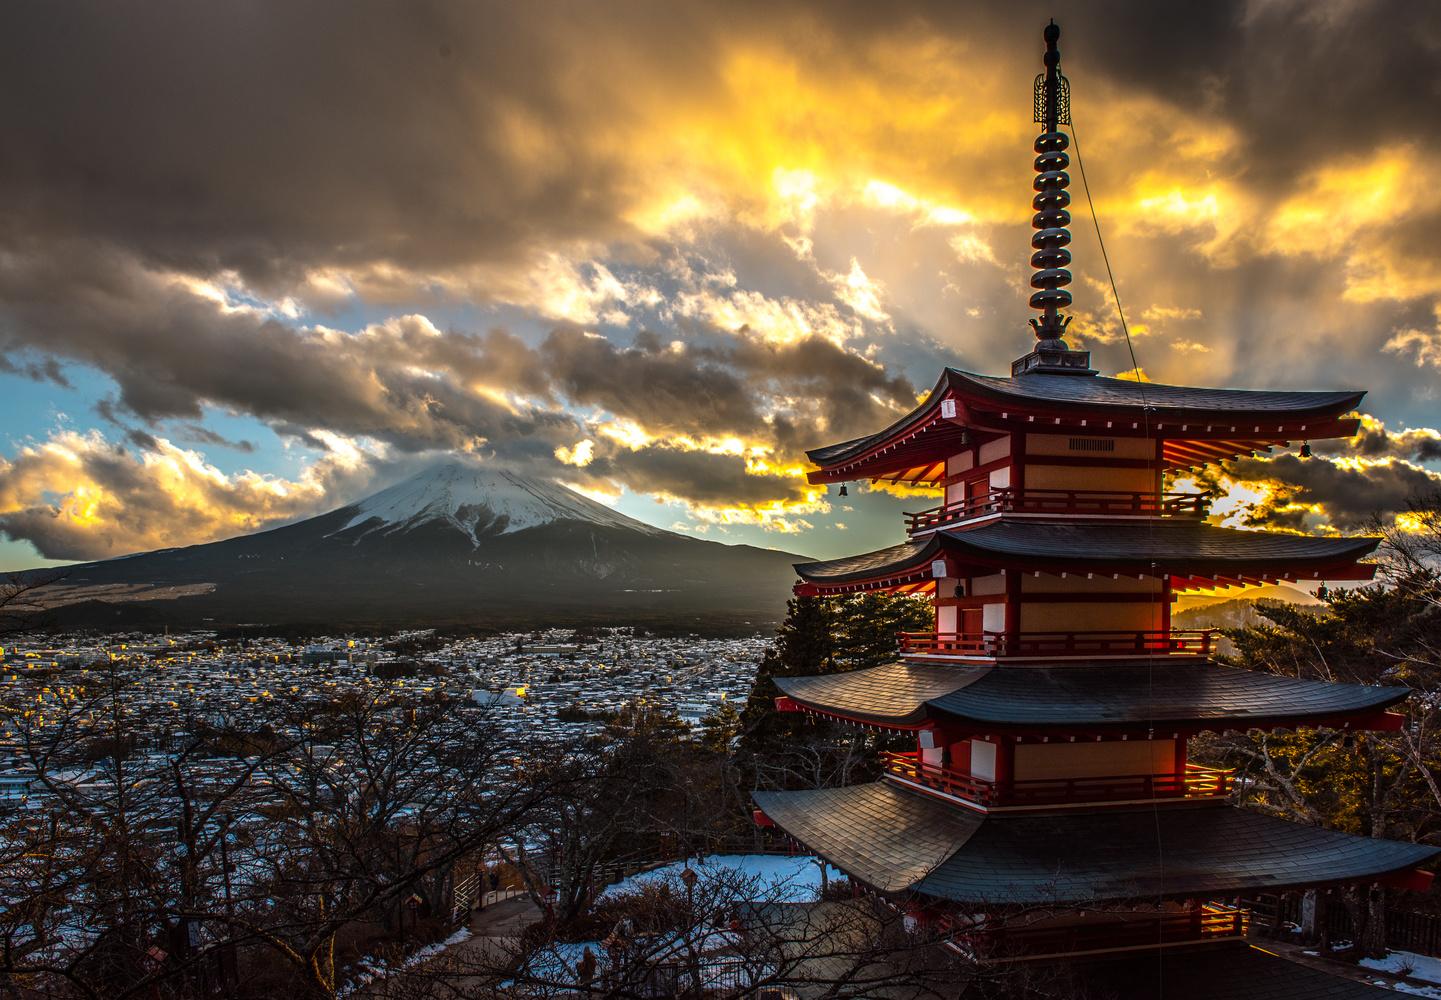 Enlightened Pagoda by Allen Ng